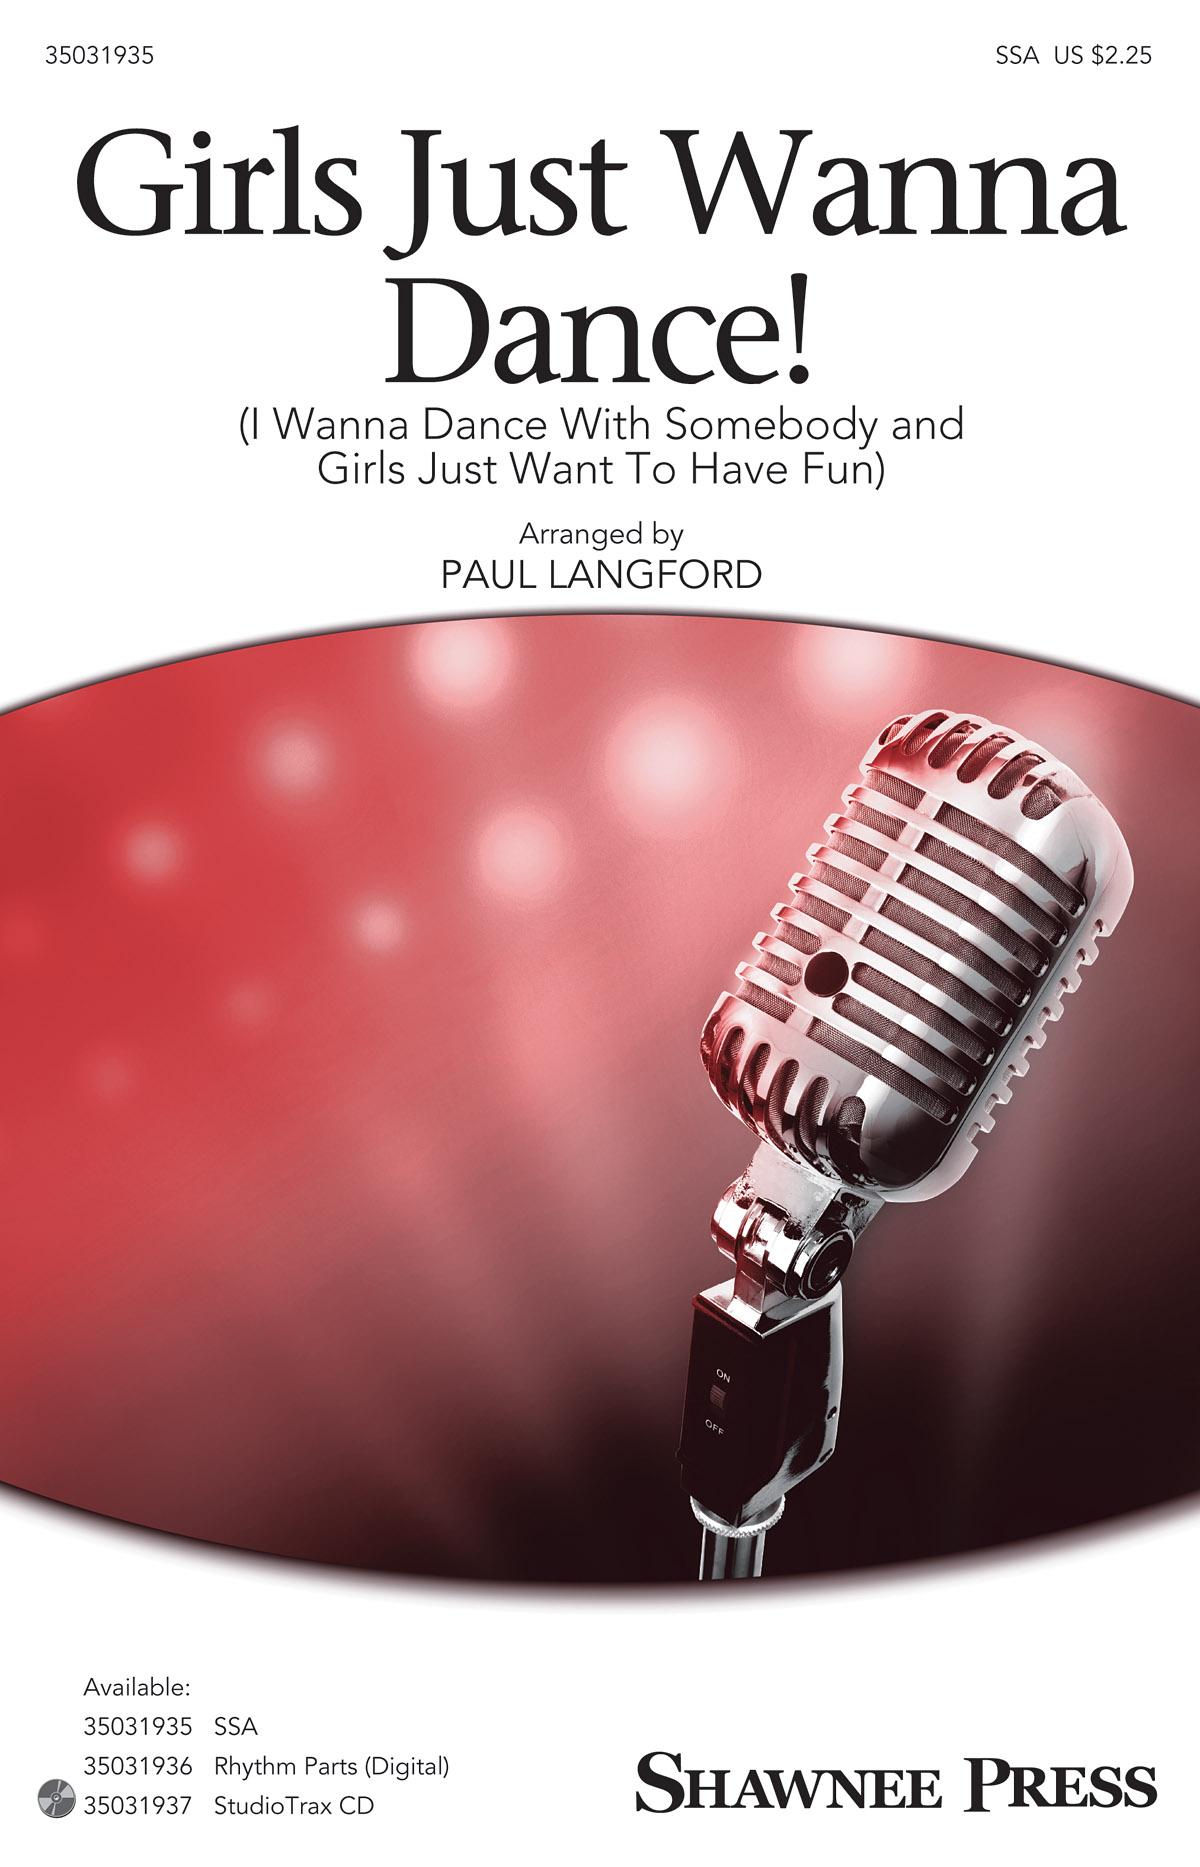 George Merrill Robert Hazard Shannon Rubicam: Girls Just Wanna Dance!: SSA: